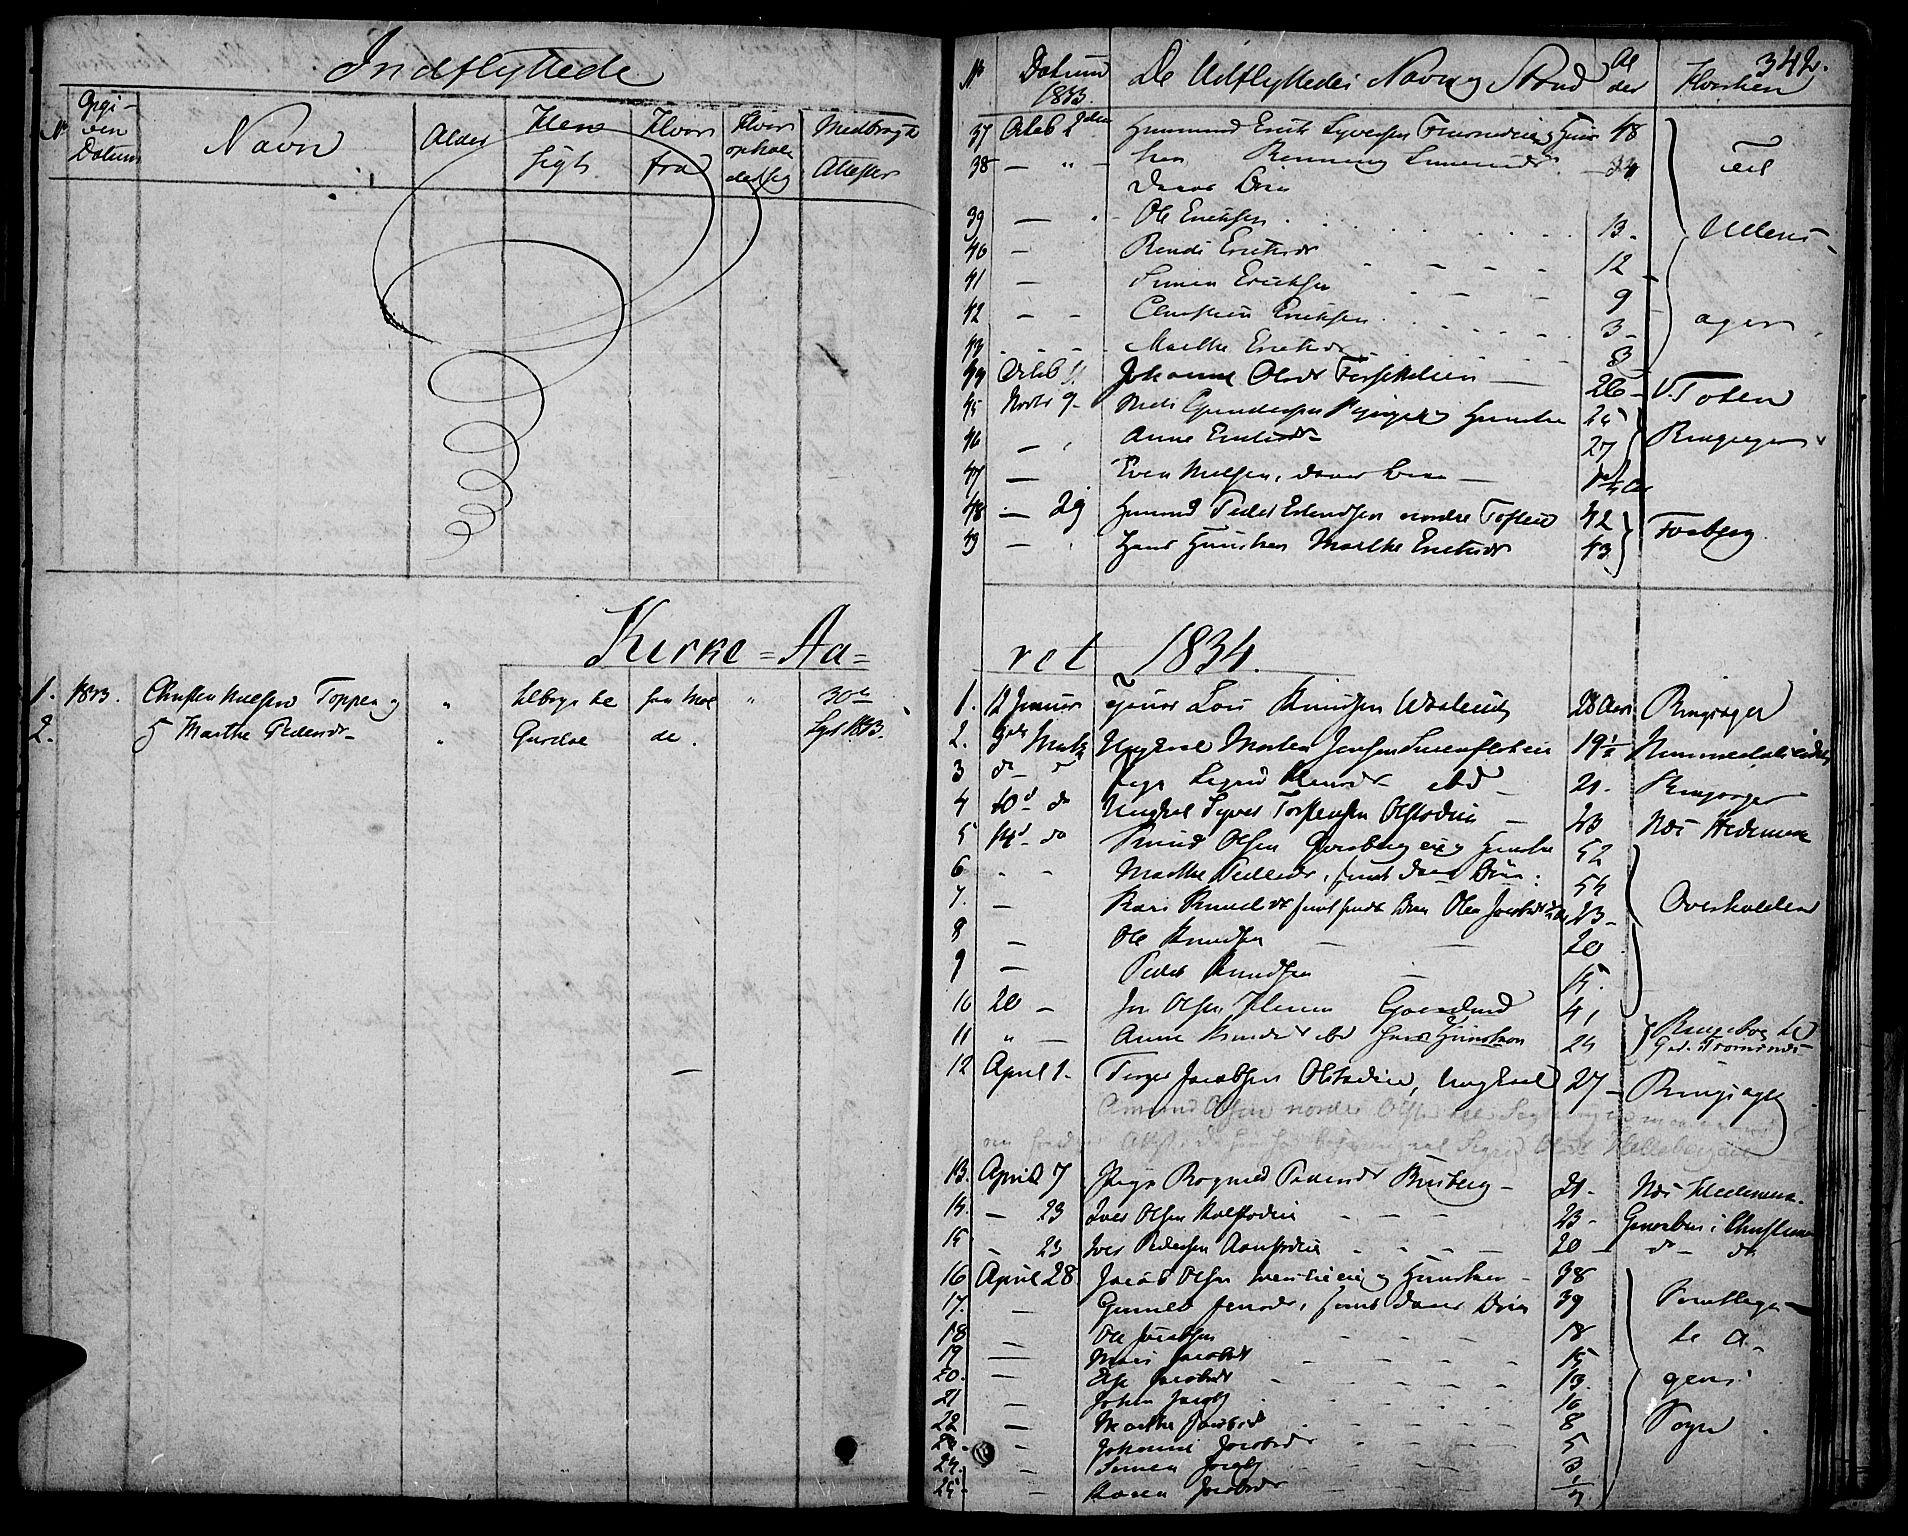 SAH, Gausdal prestekontor, Ministerialbok nr. 6, 1830-1839, s. 342